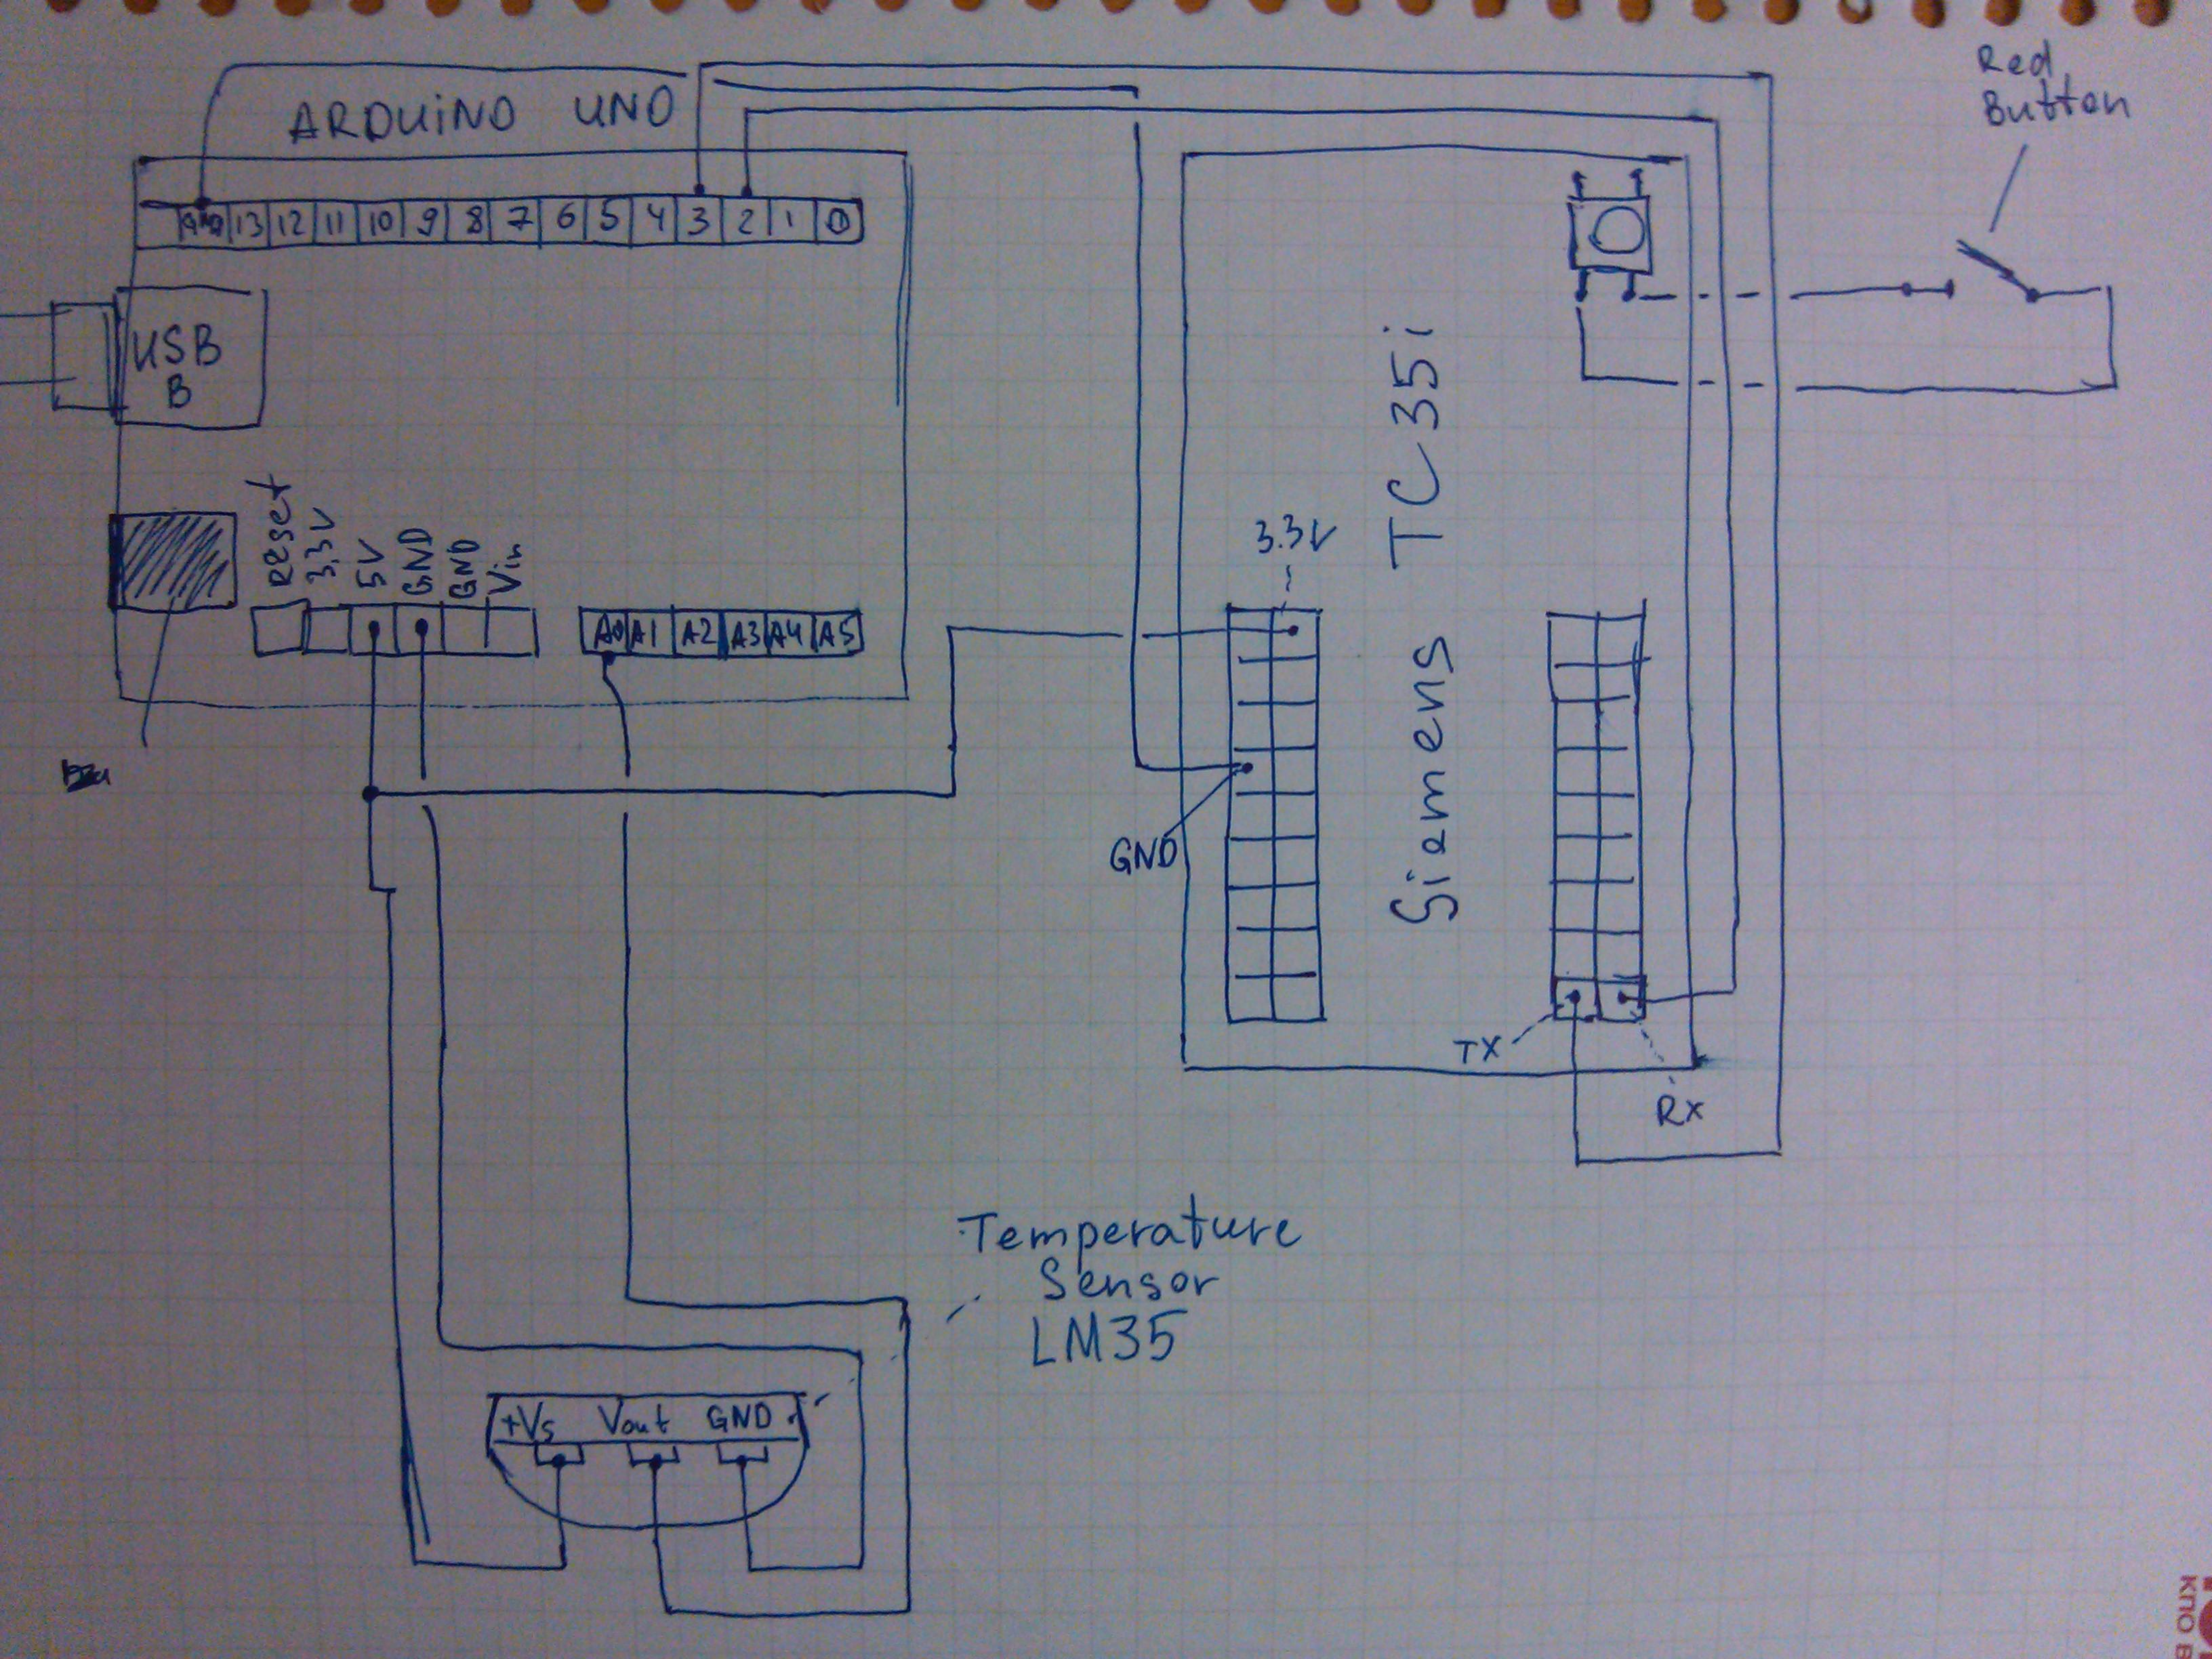 wiring_scheme.jpg, Wiring scheme of how to connect Arduino UNO, Siements  TC35 and LM35 temperature sensor Arduino Uno Siements TC35 ...